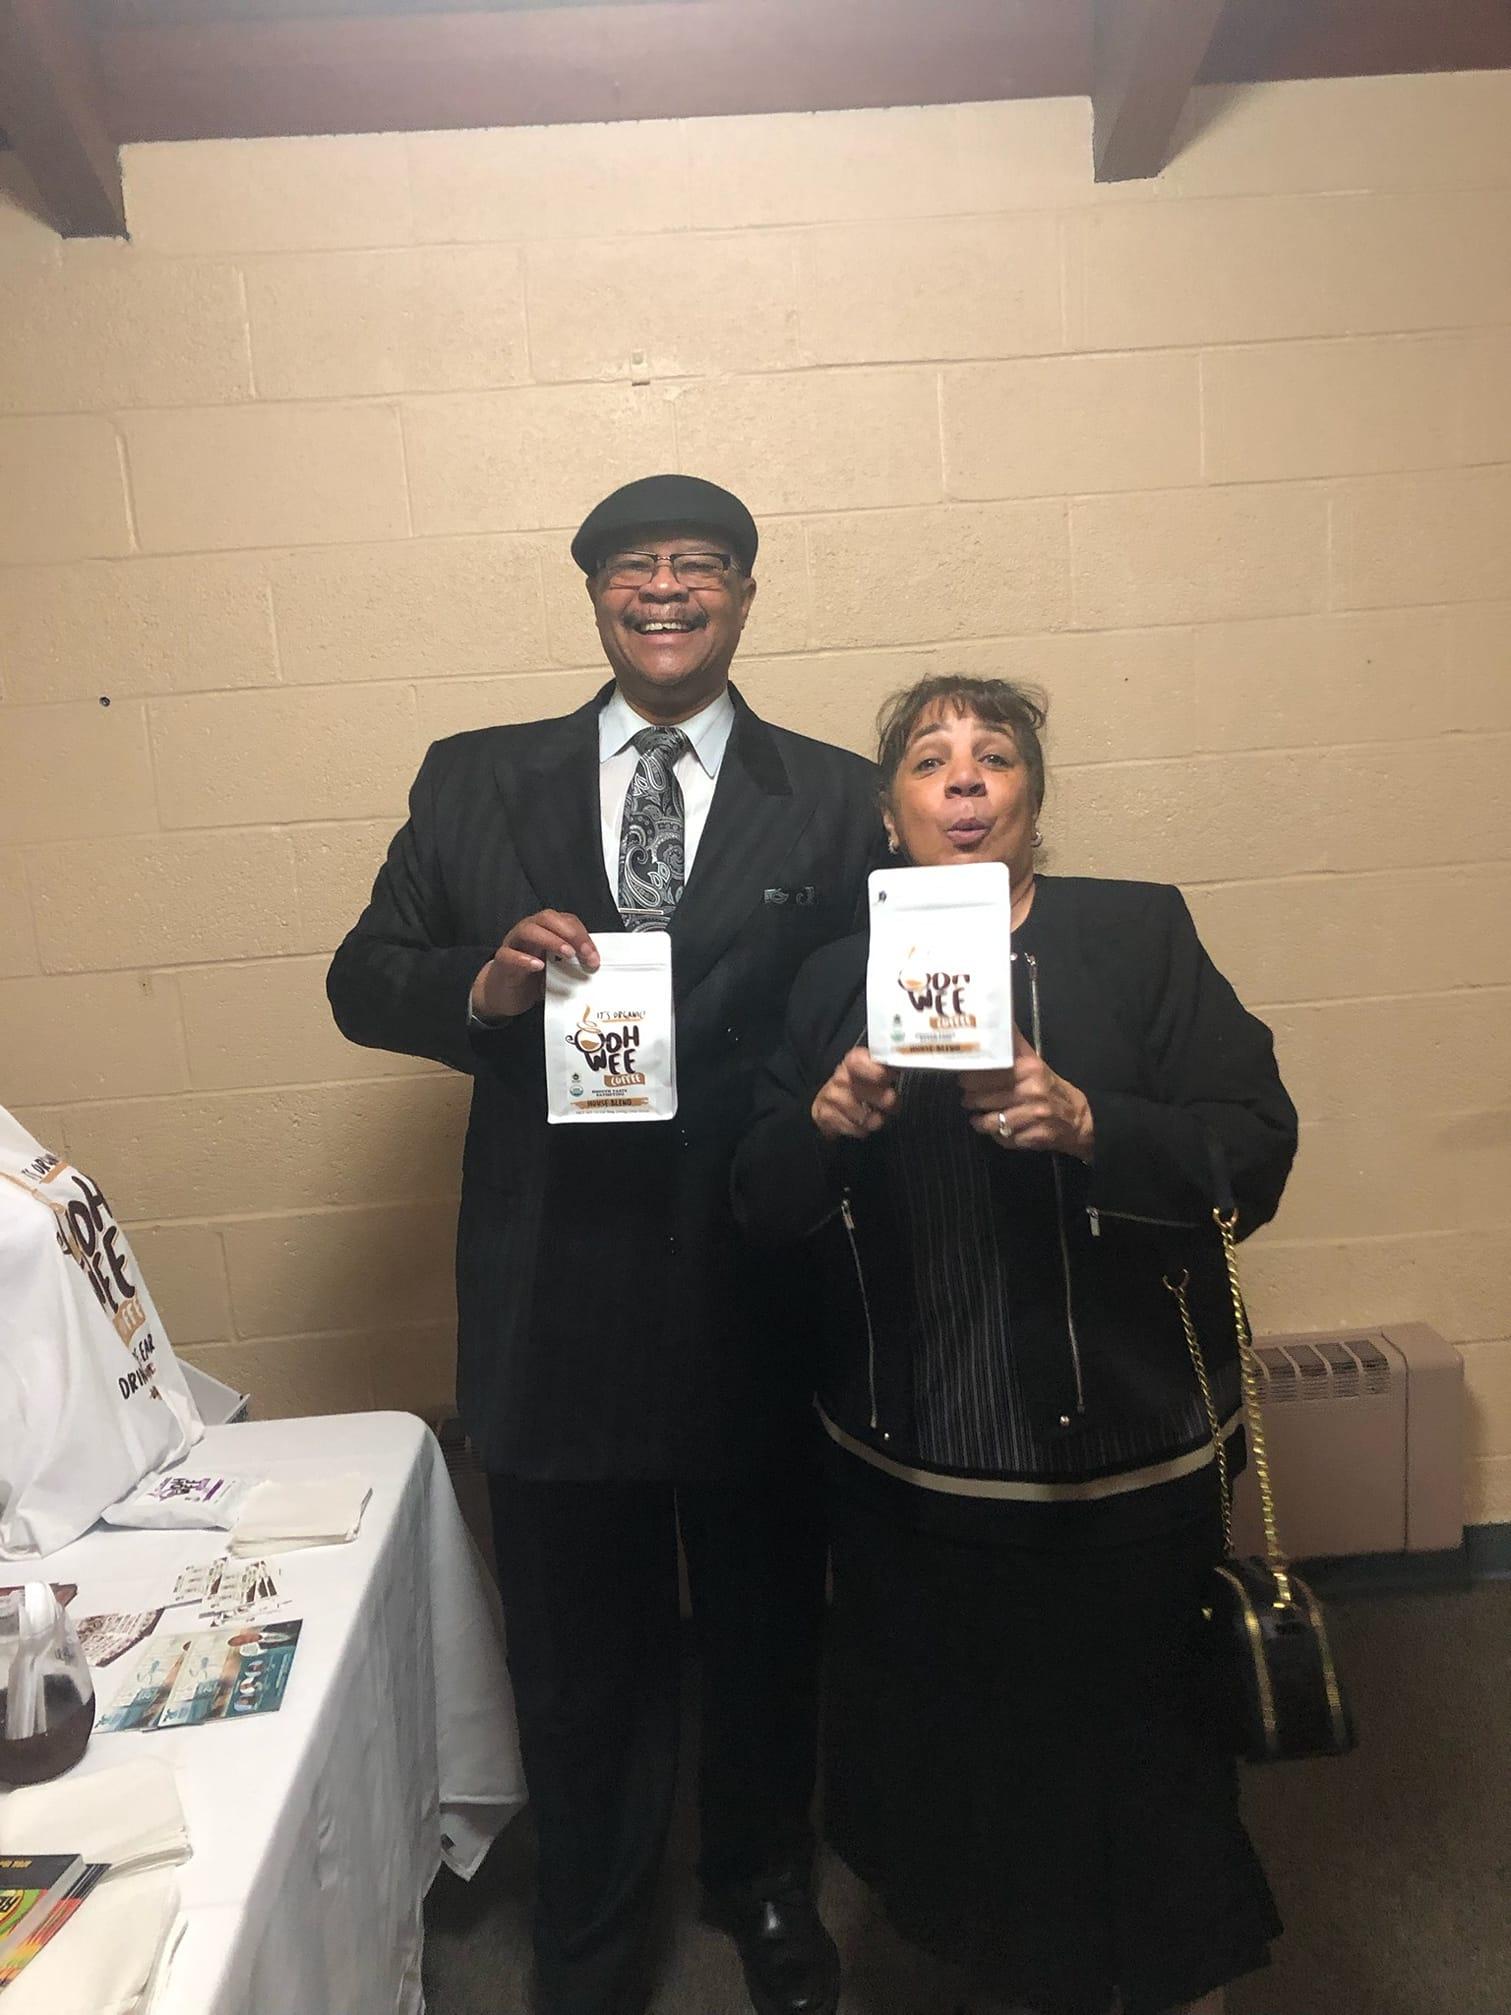 Mr. and Mrs Presberry